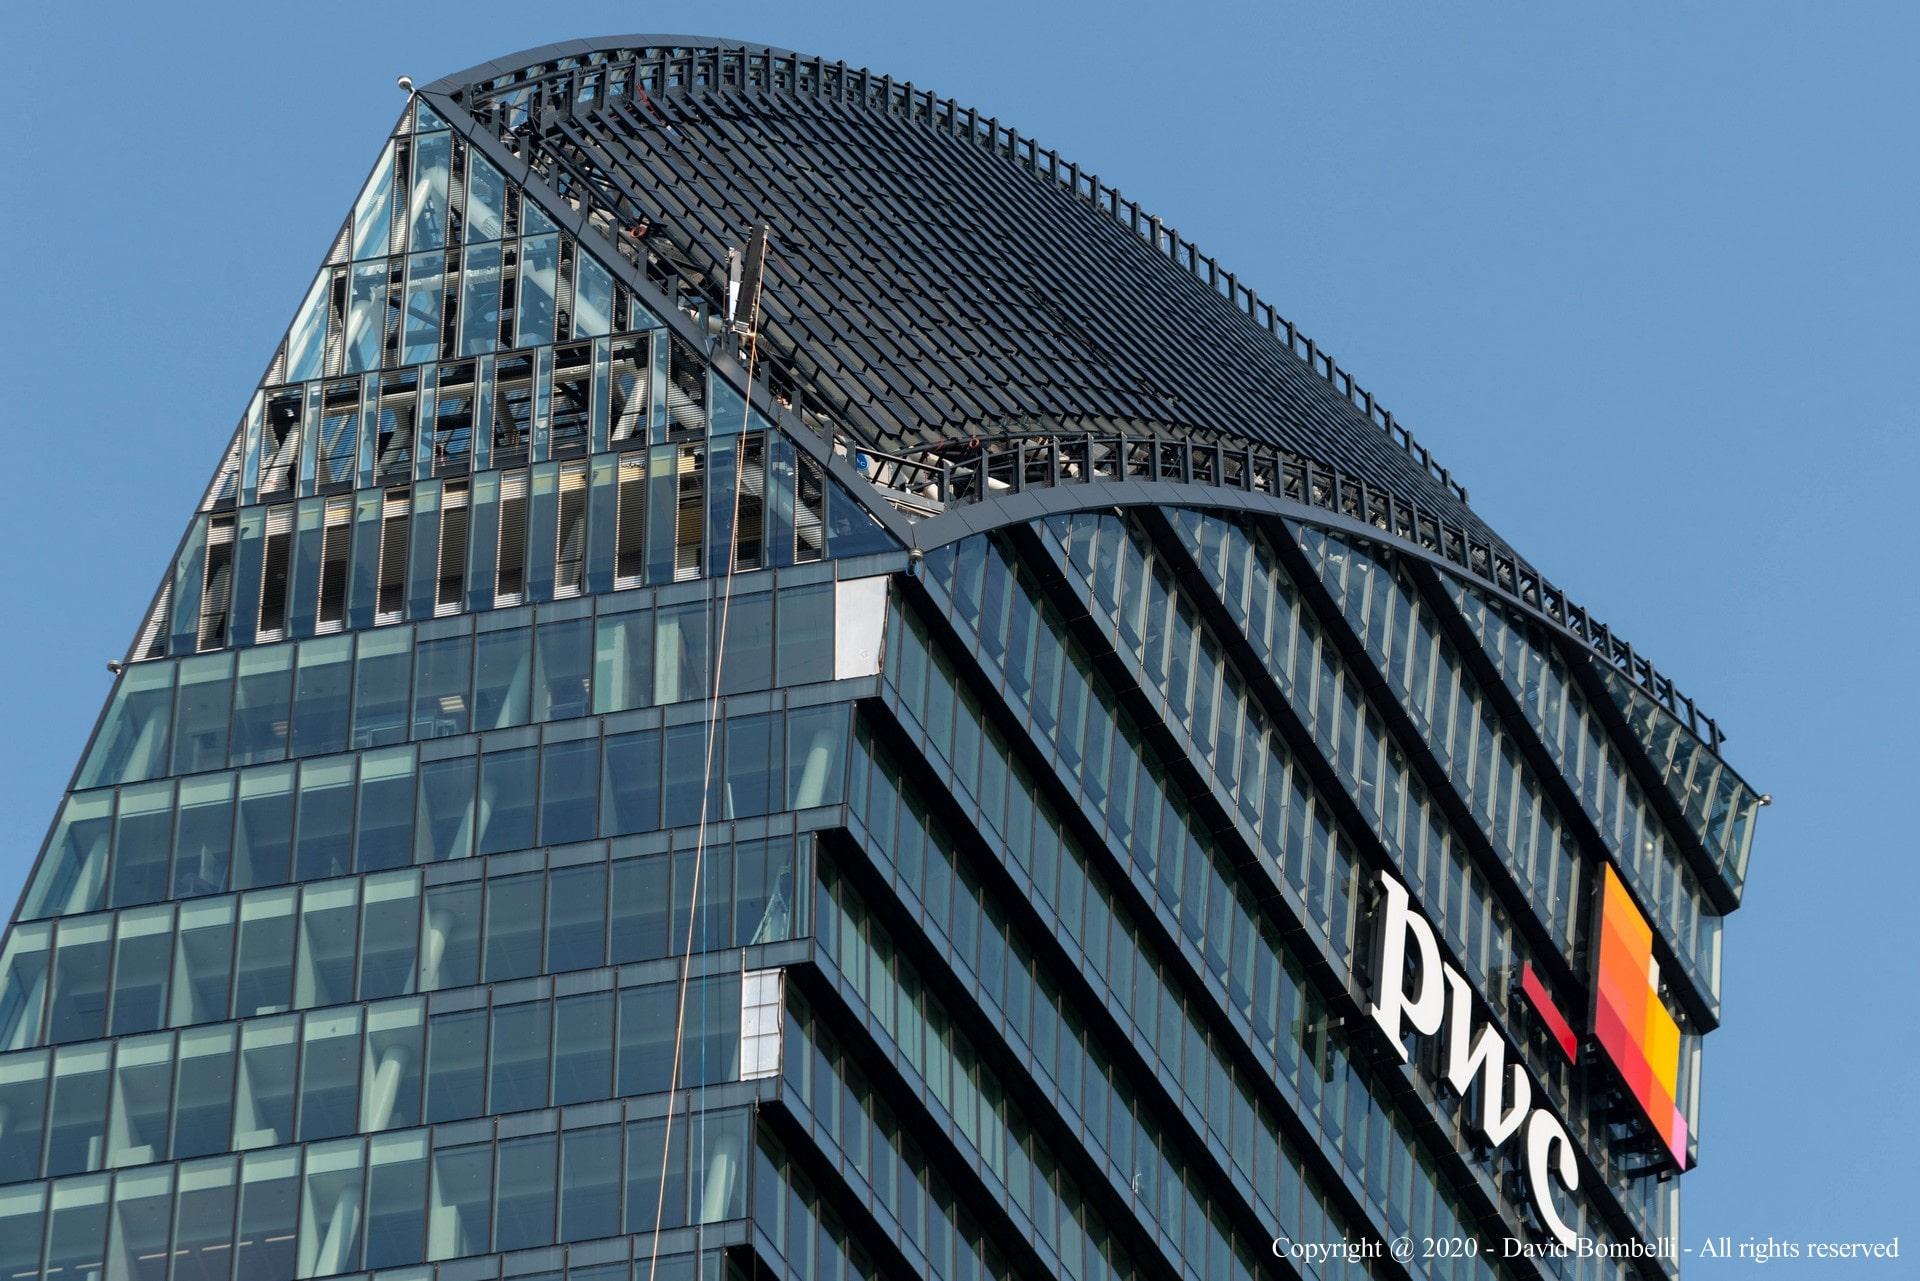 Torre PwC_Photo Courtesy David Bombelli (2)